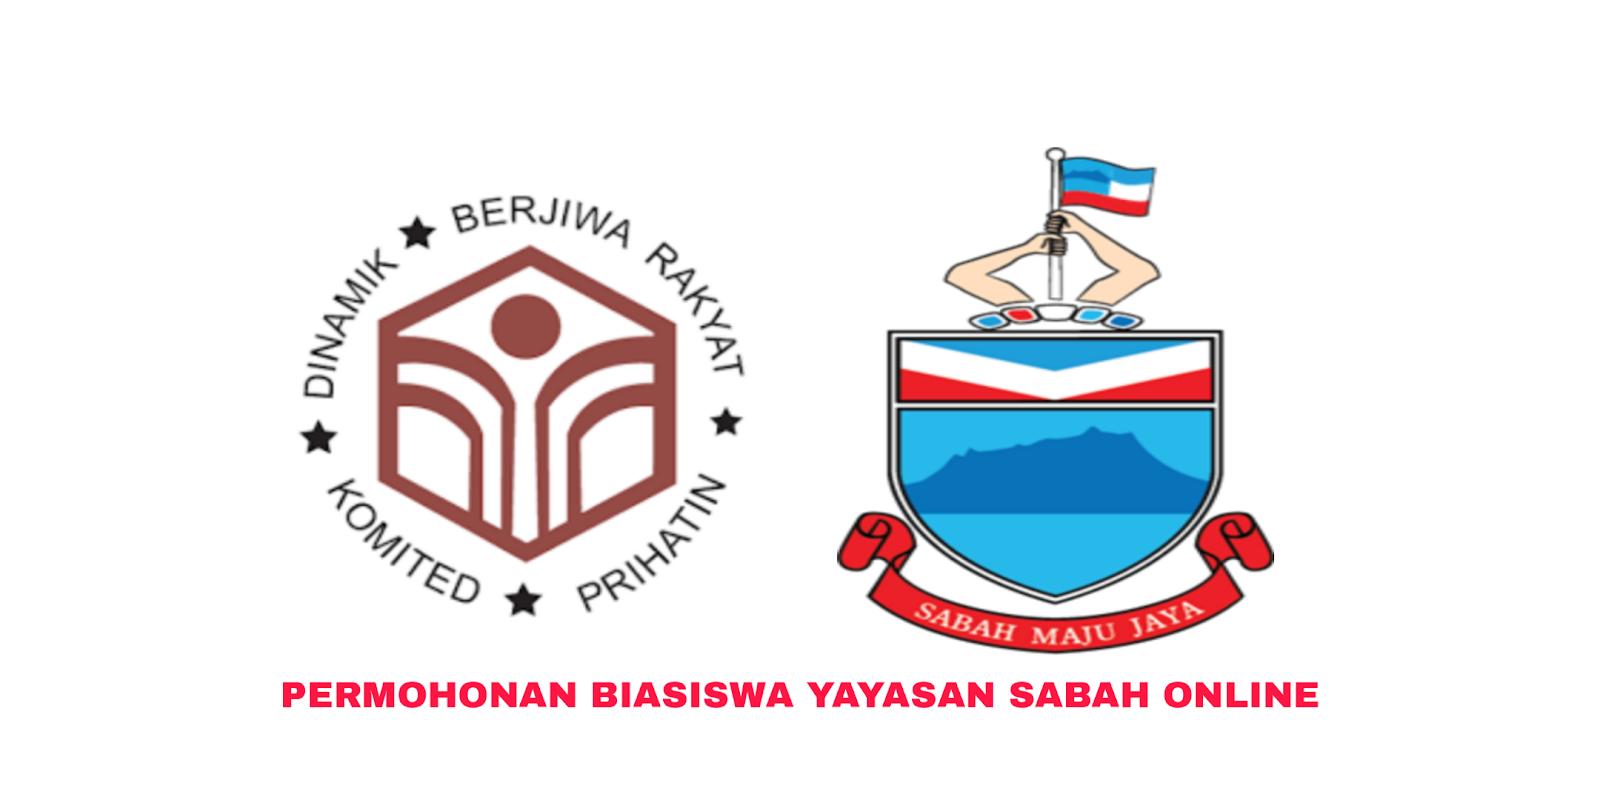 Permohonan Biasiswa Yayasan Sabah 2021 Online Borang Semakan Upu